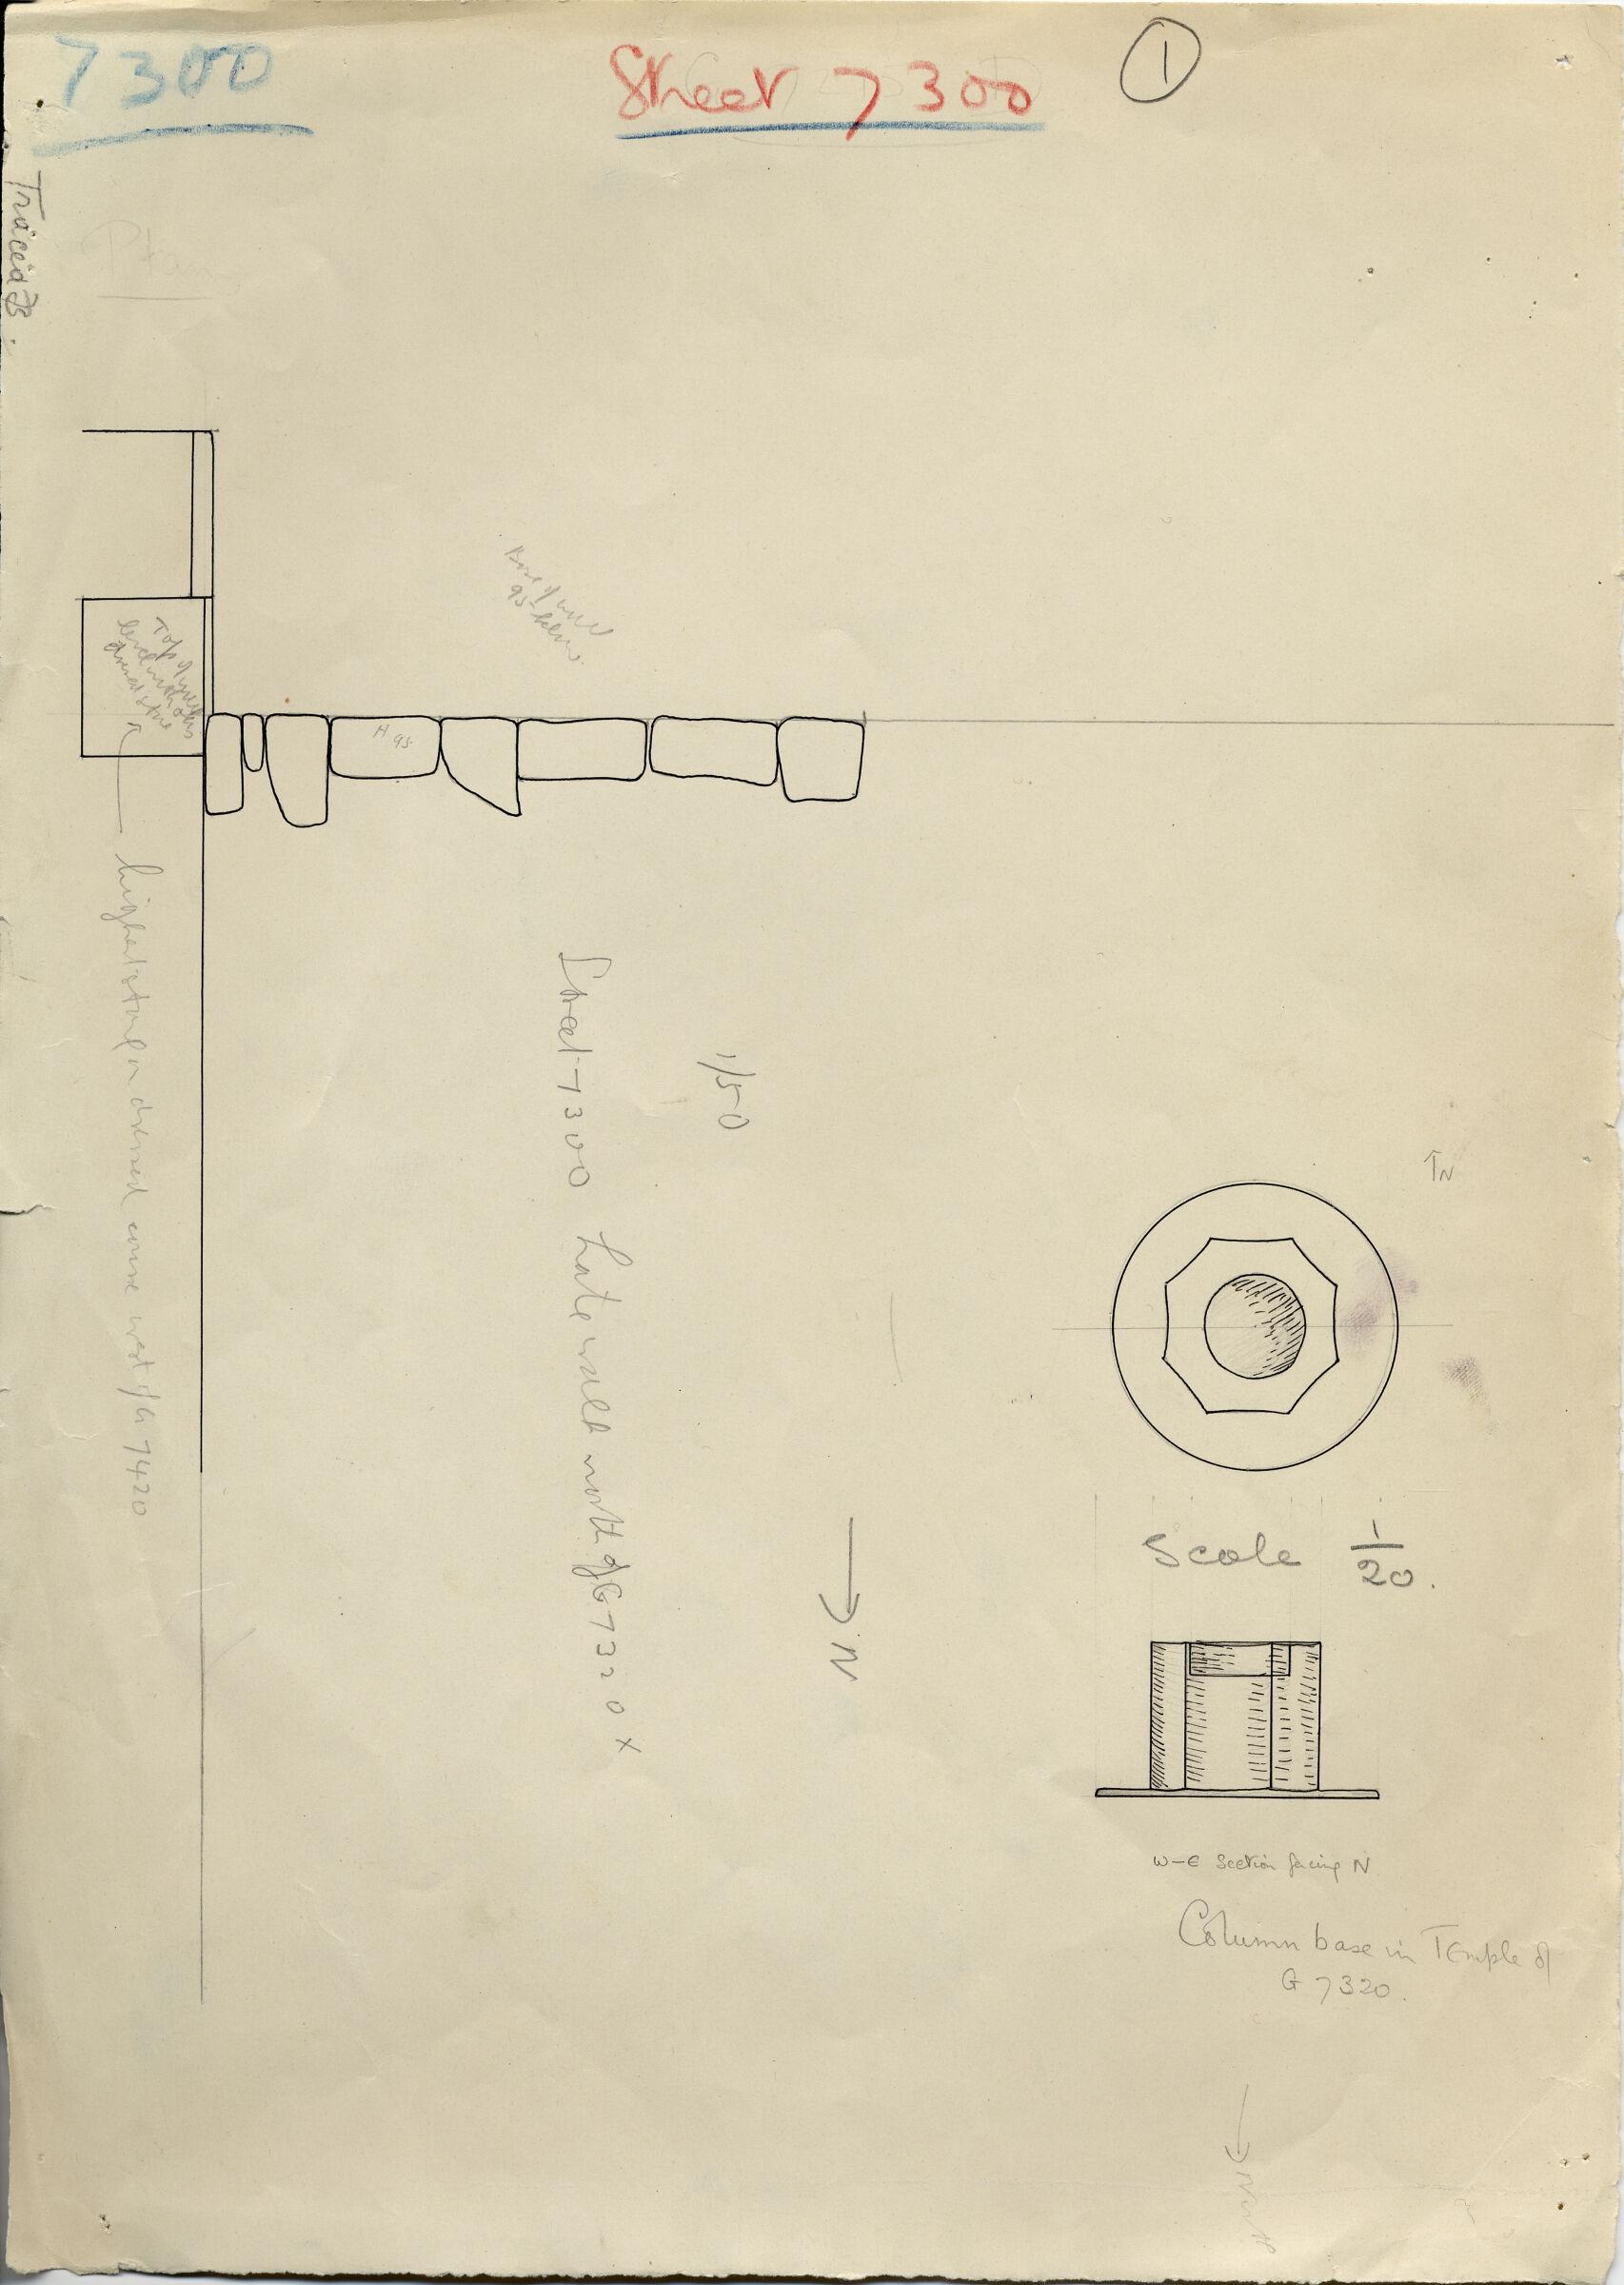 Maps and plans: G 7300 Pt i wall; G 7310-7320: G 7320 column base